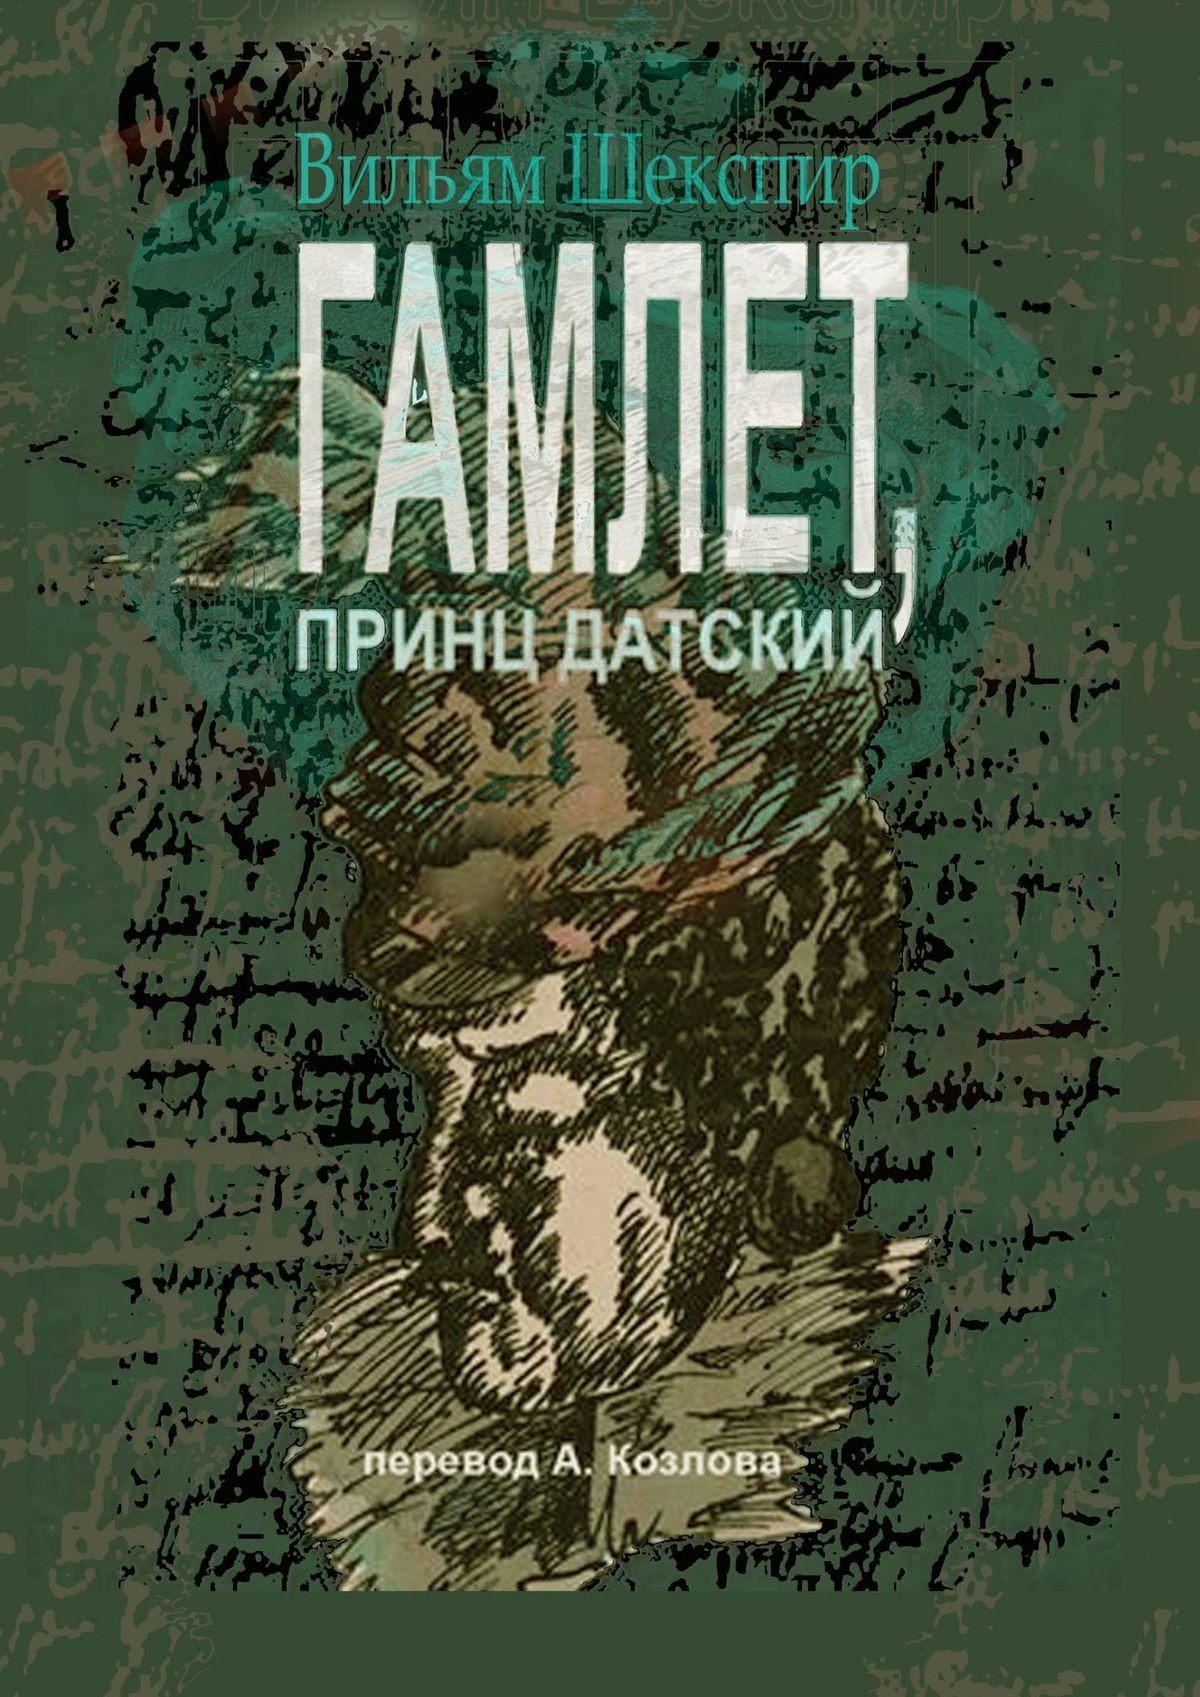 Вильям Шекспир Гамлет, принц датский. Перевод Алексея Козлова уильям шекспир макбет новый перевод алексея козлова